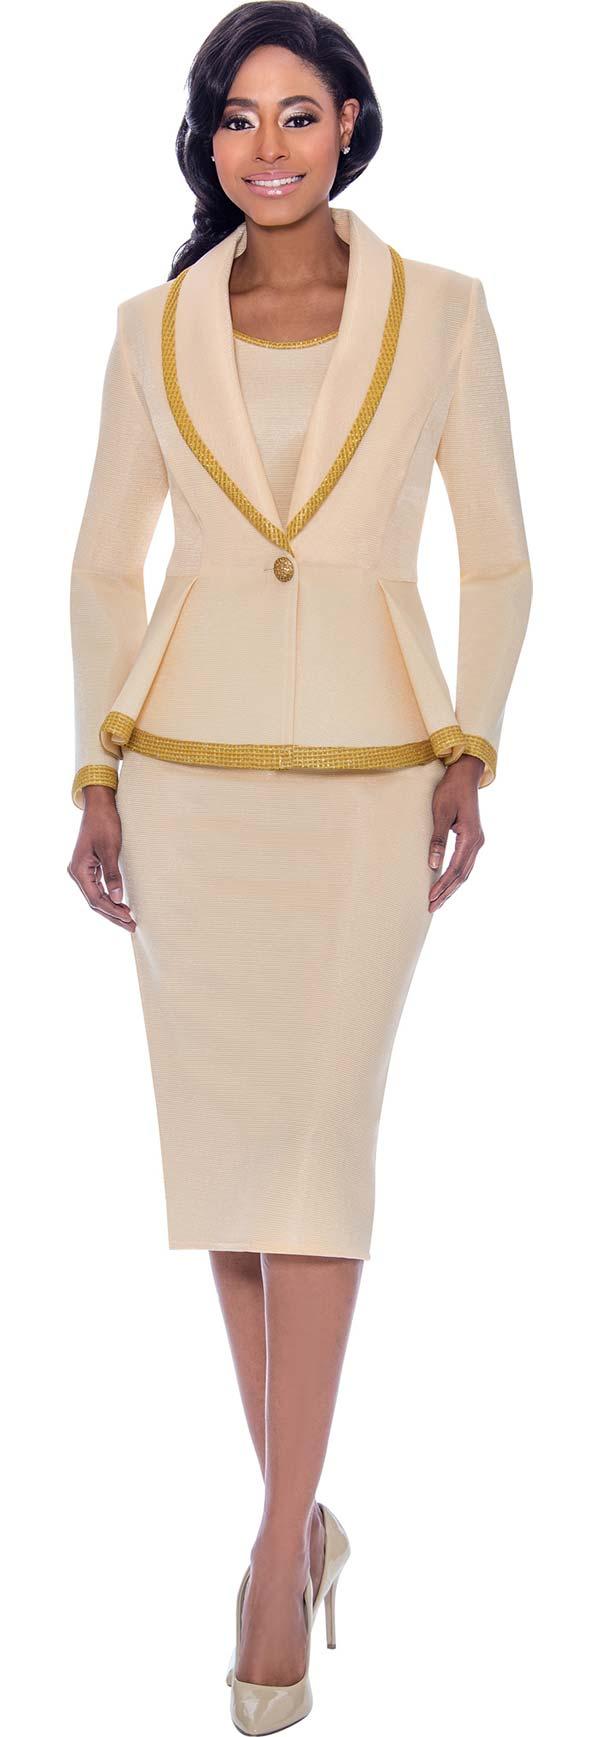 Susanna 3925 - Skirt & Jacket Set With Trimmed Shawl Lapel Pleated Jacket